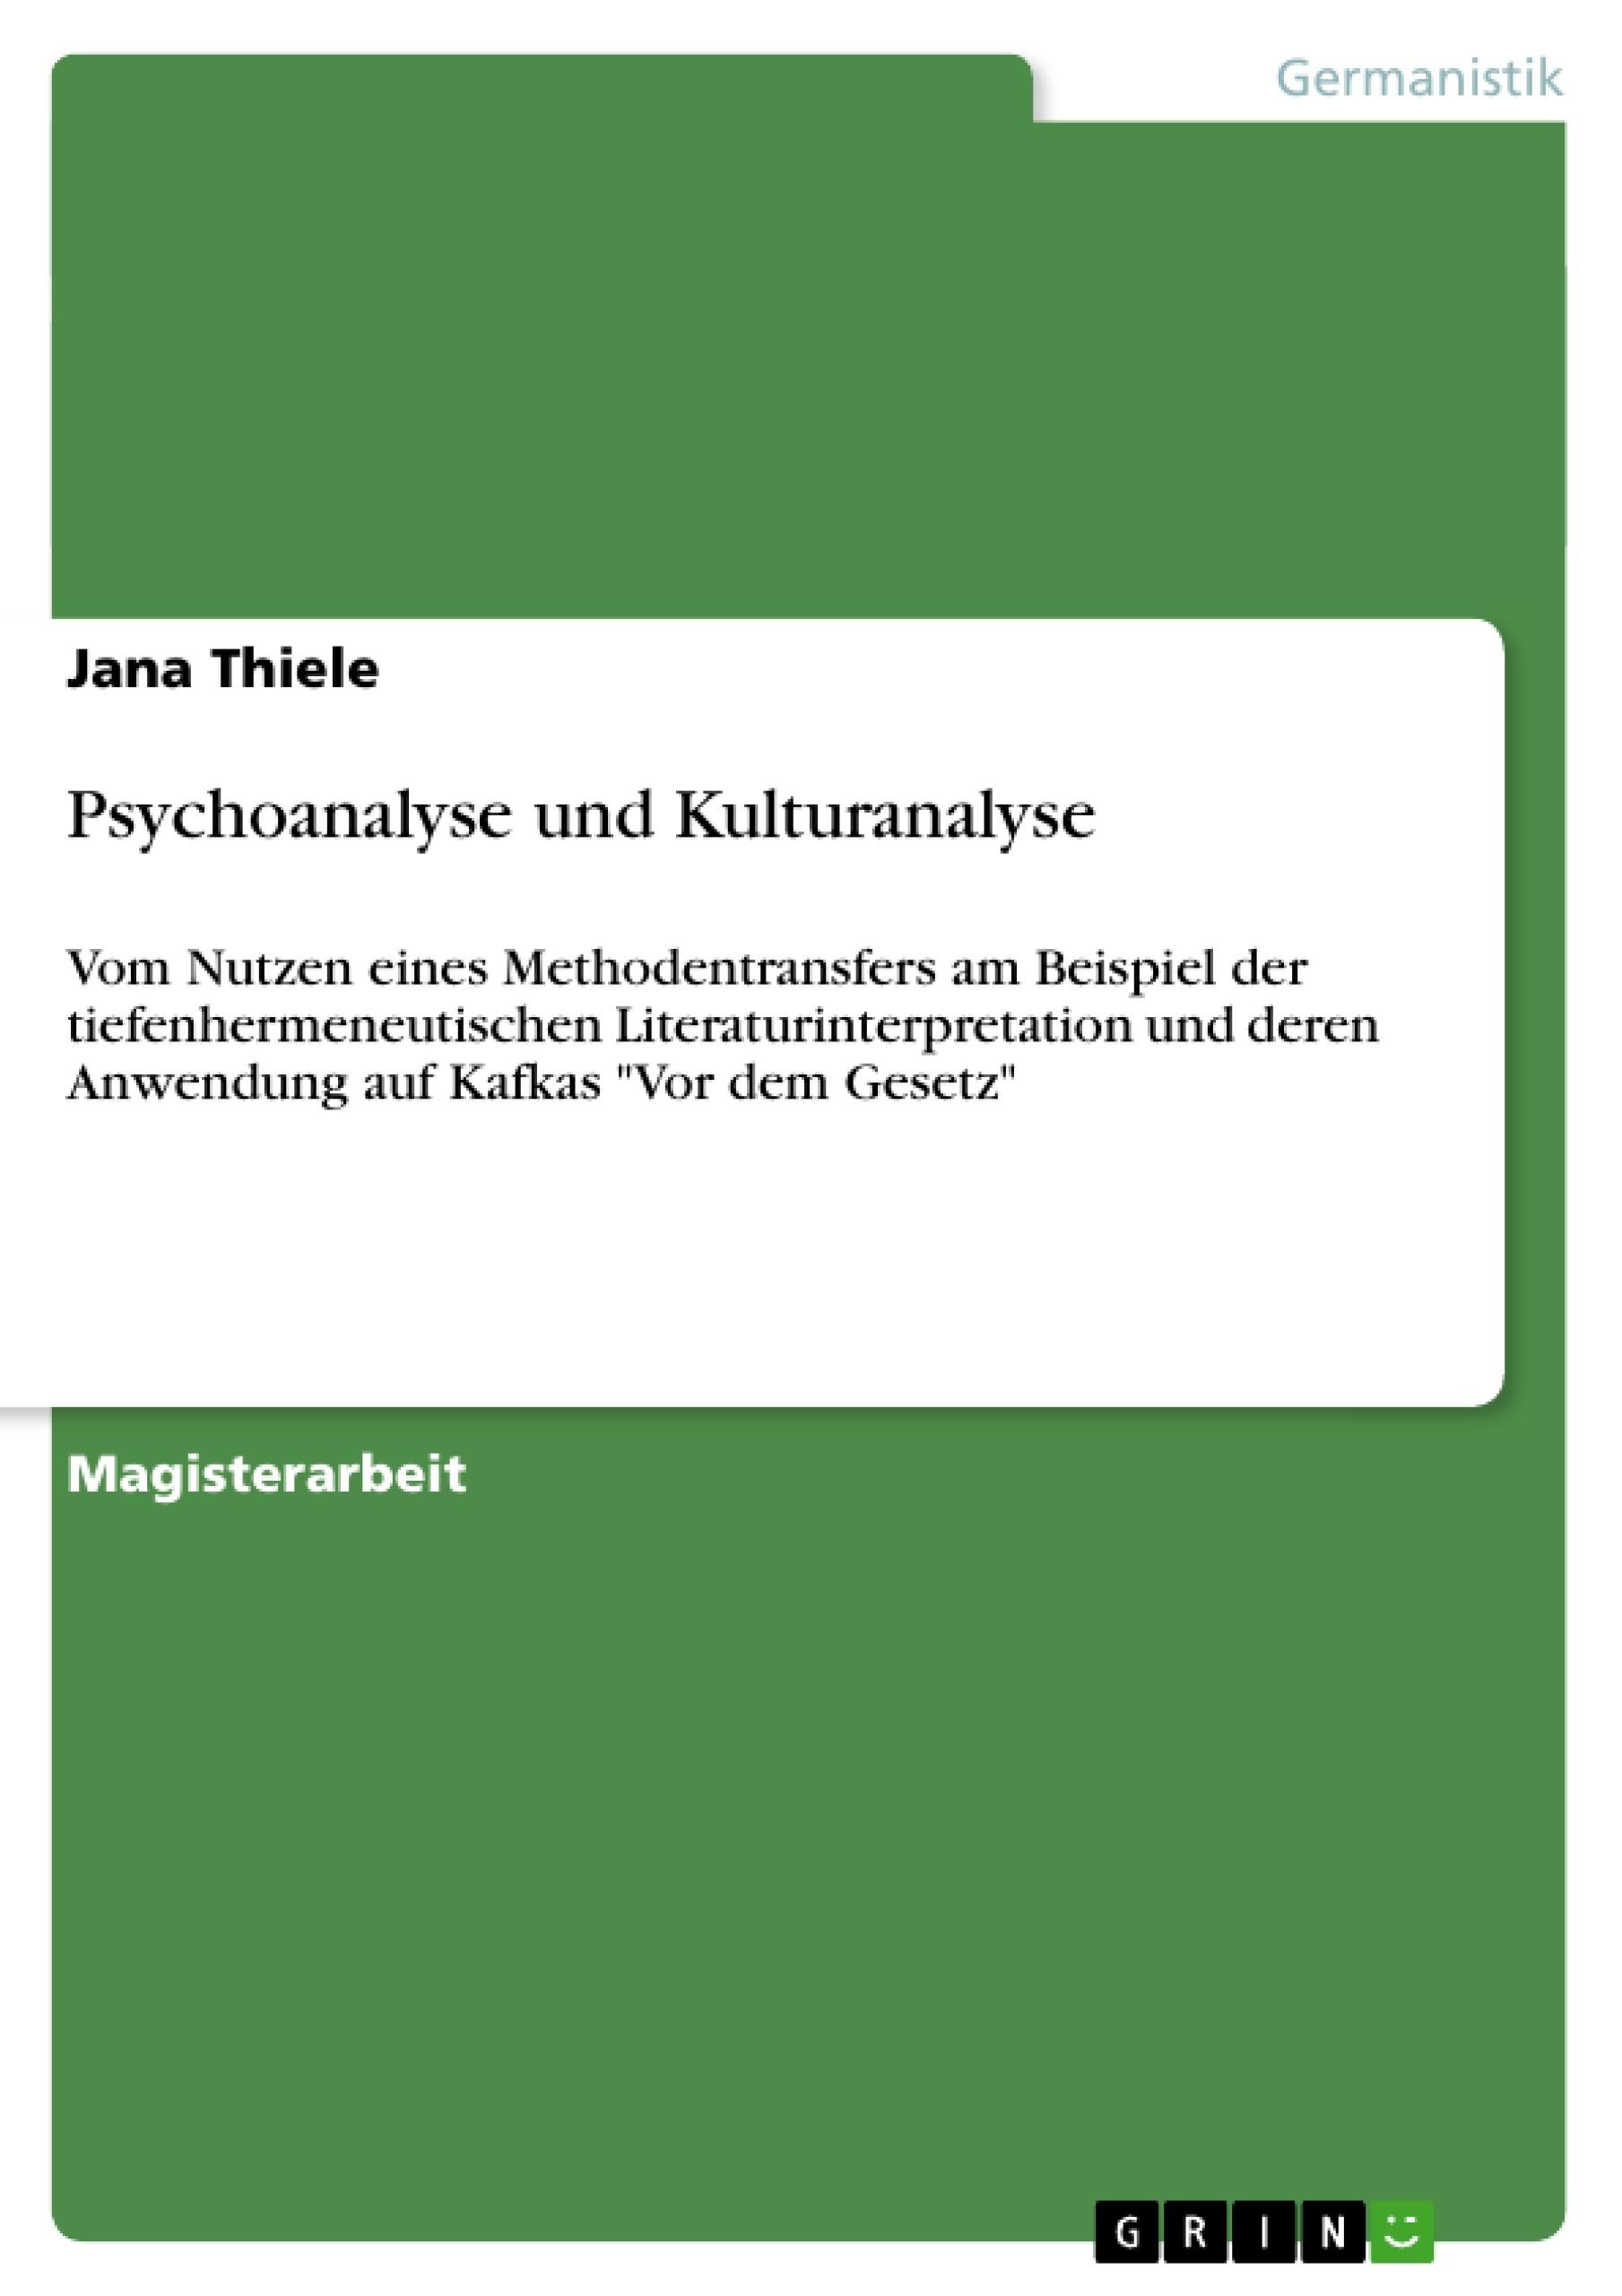 Titel: Psychoanalyse und Kulturanalyse